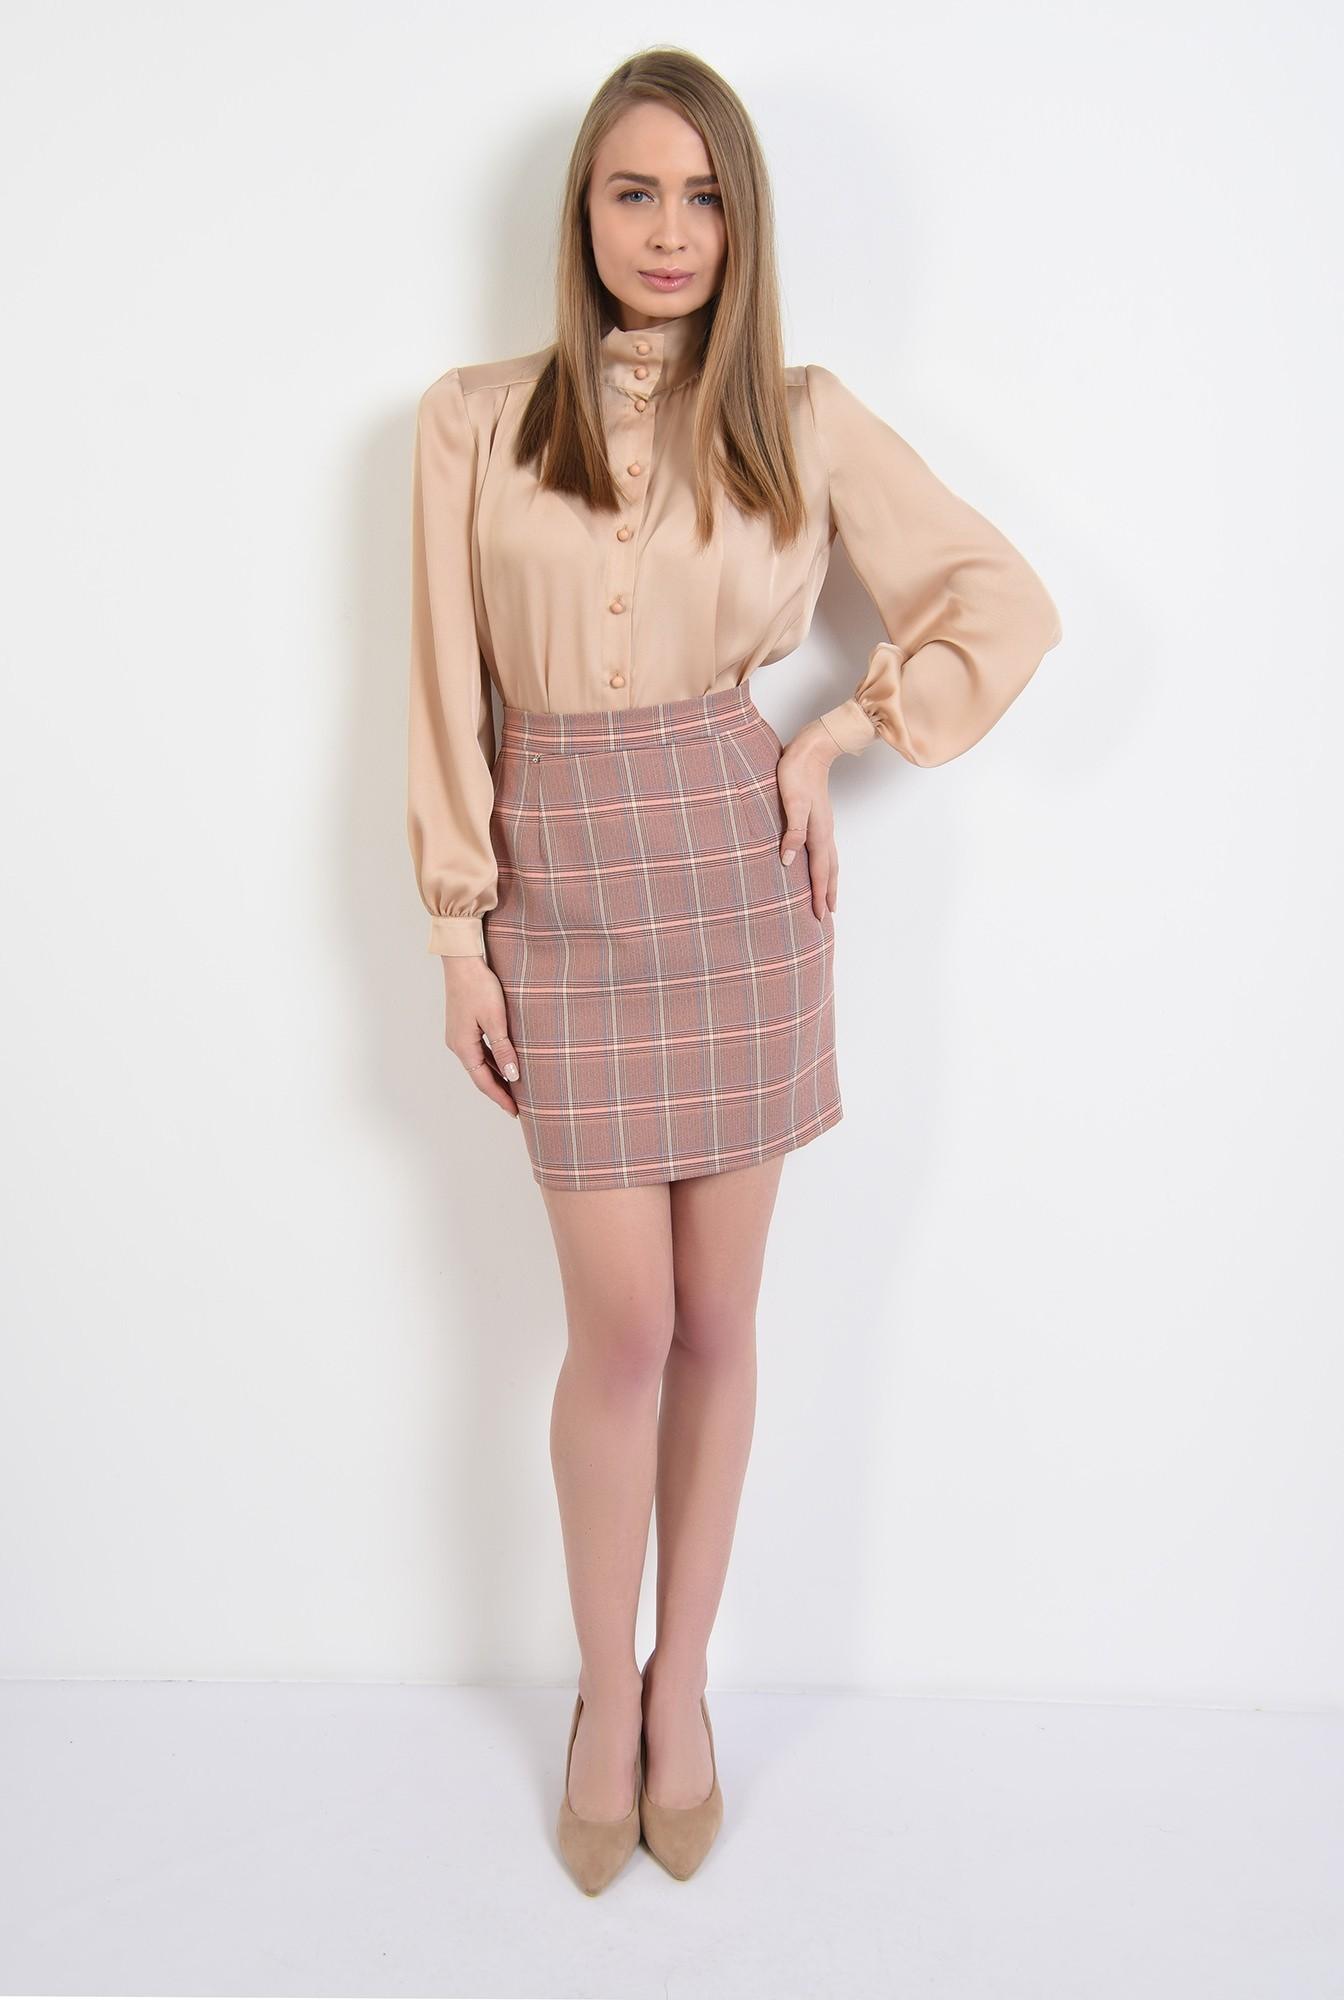 3 -  fusta in carouri, nude, peach, mini, cu talie inalta, fusta office